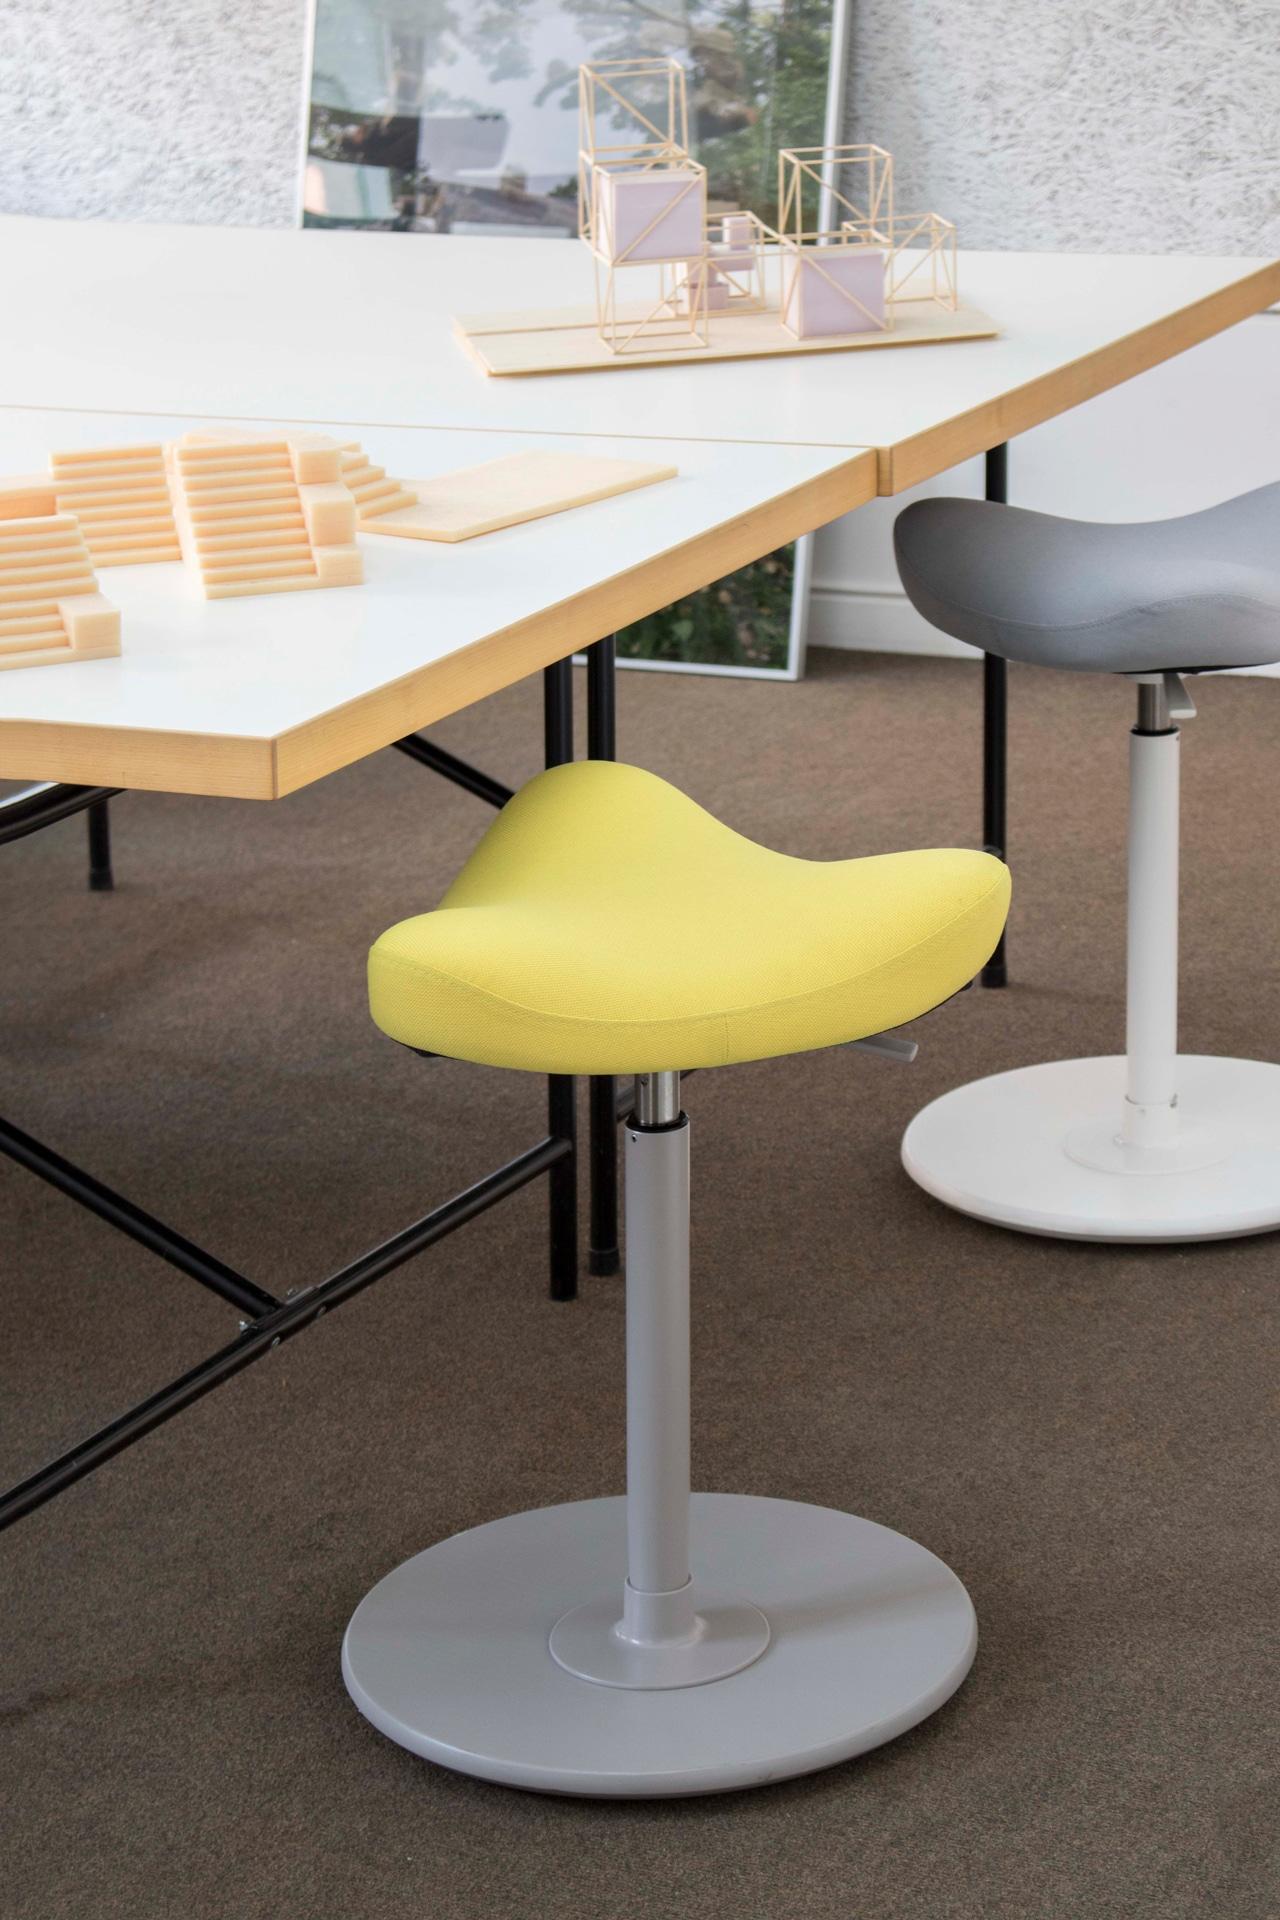 ergonomische b rost hle archive bensberg wohnen. Black Bedroom Furniture Sets. Home Design Ideas